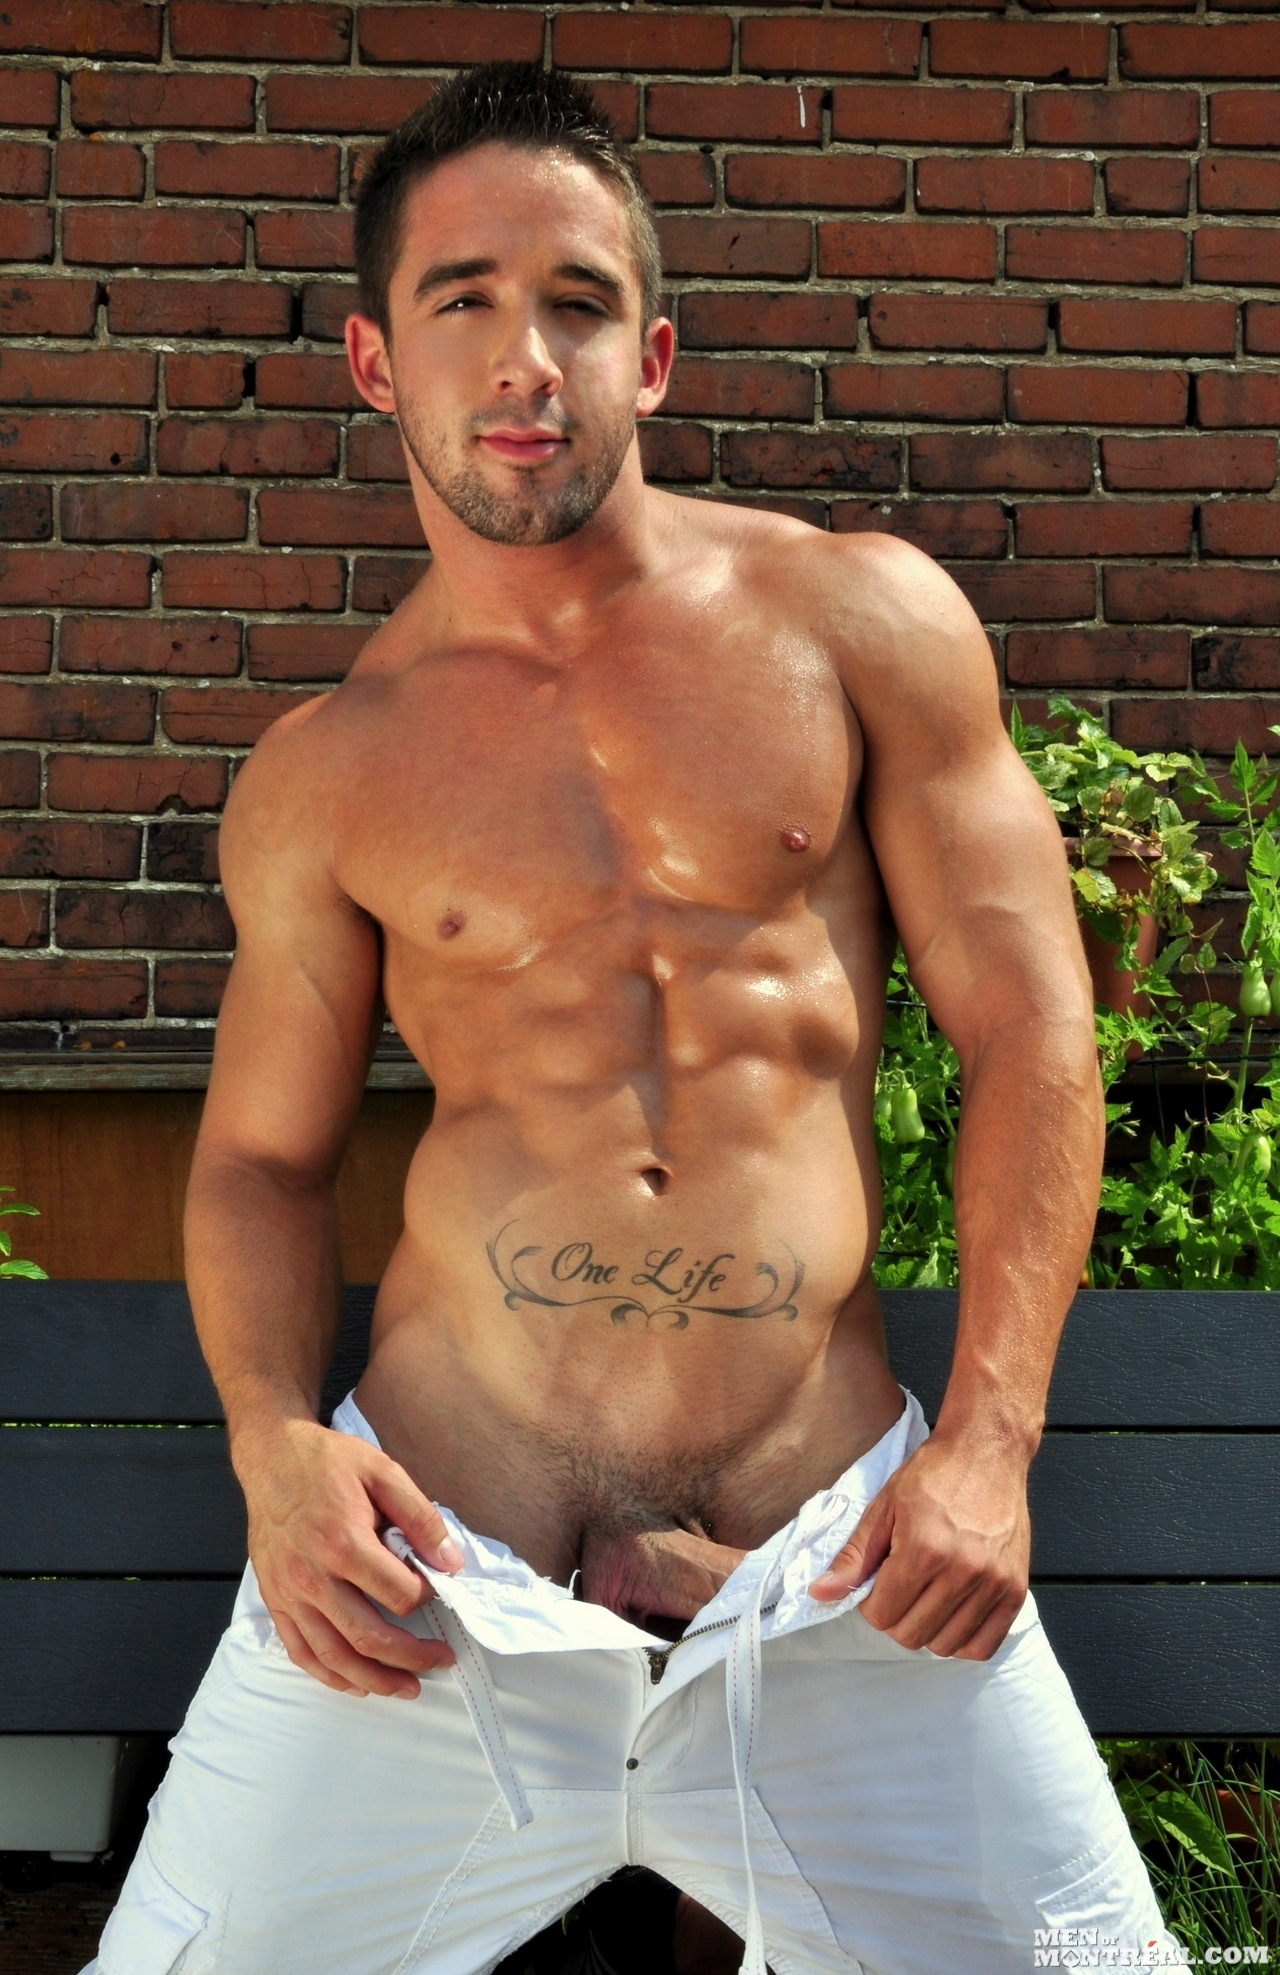 Hairy man porn star nude